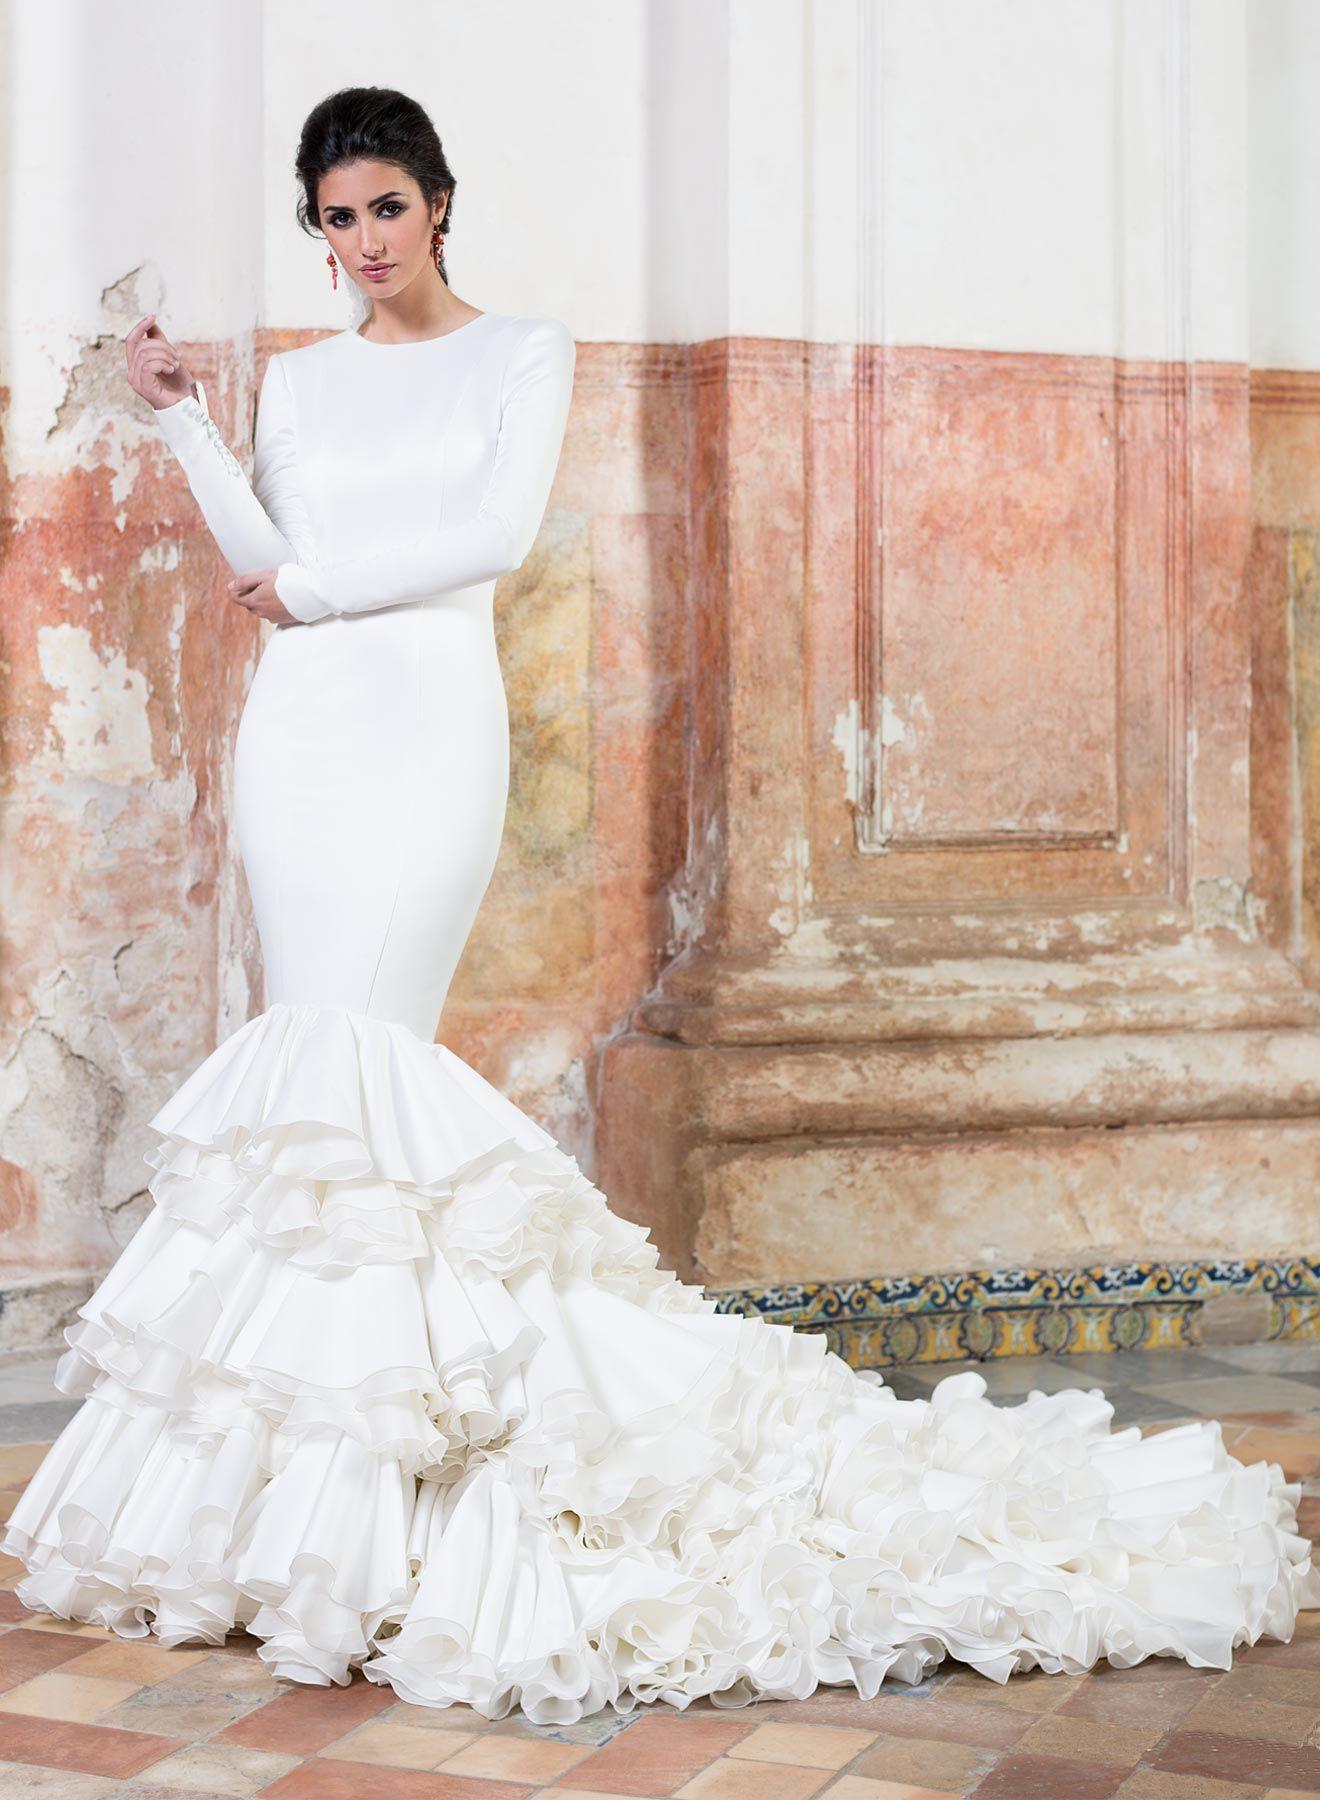 Vestidos novia vicky martin berrocal 2019